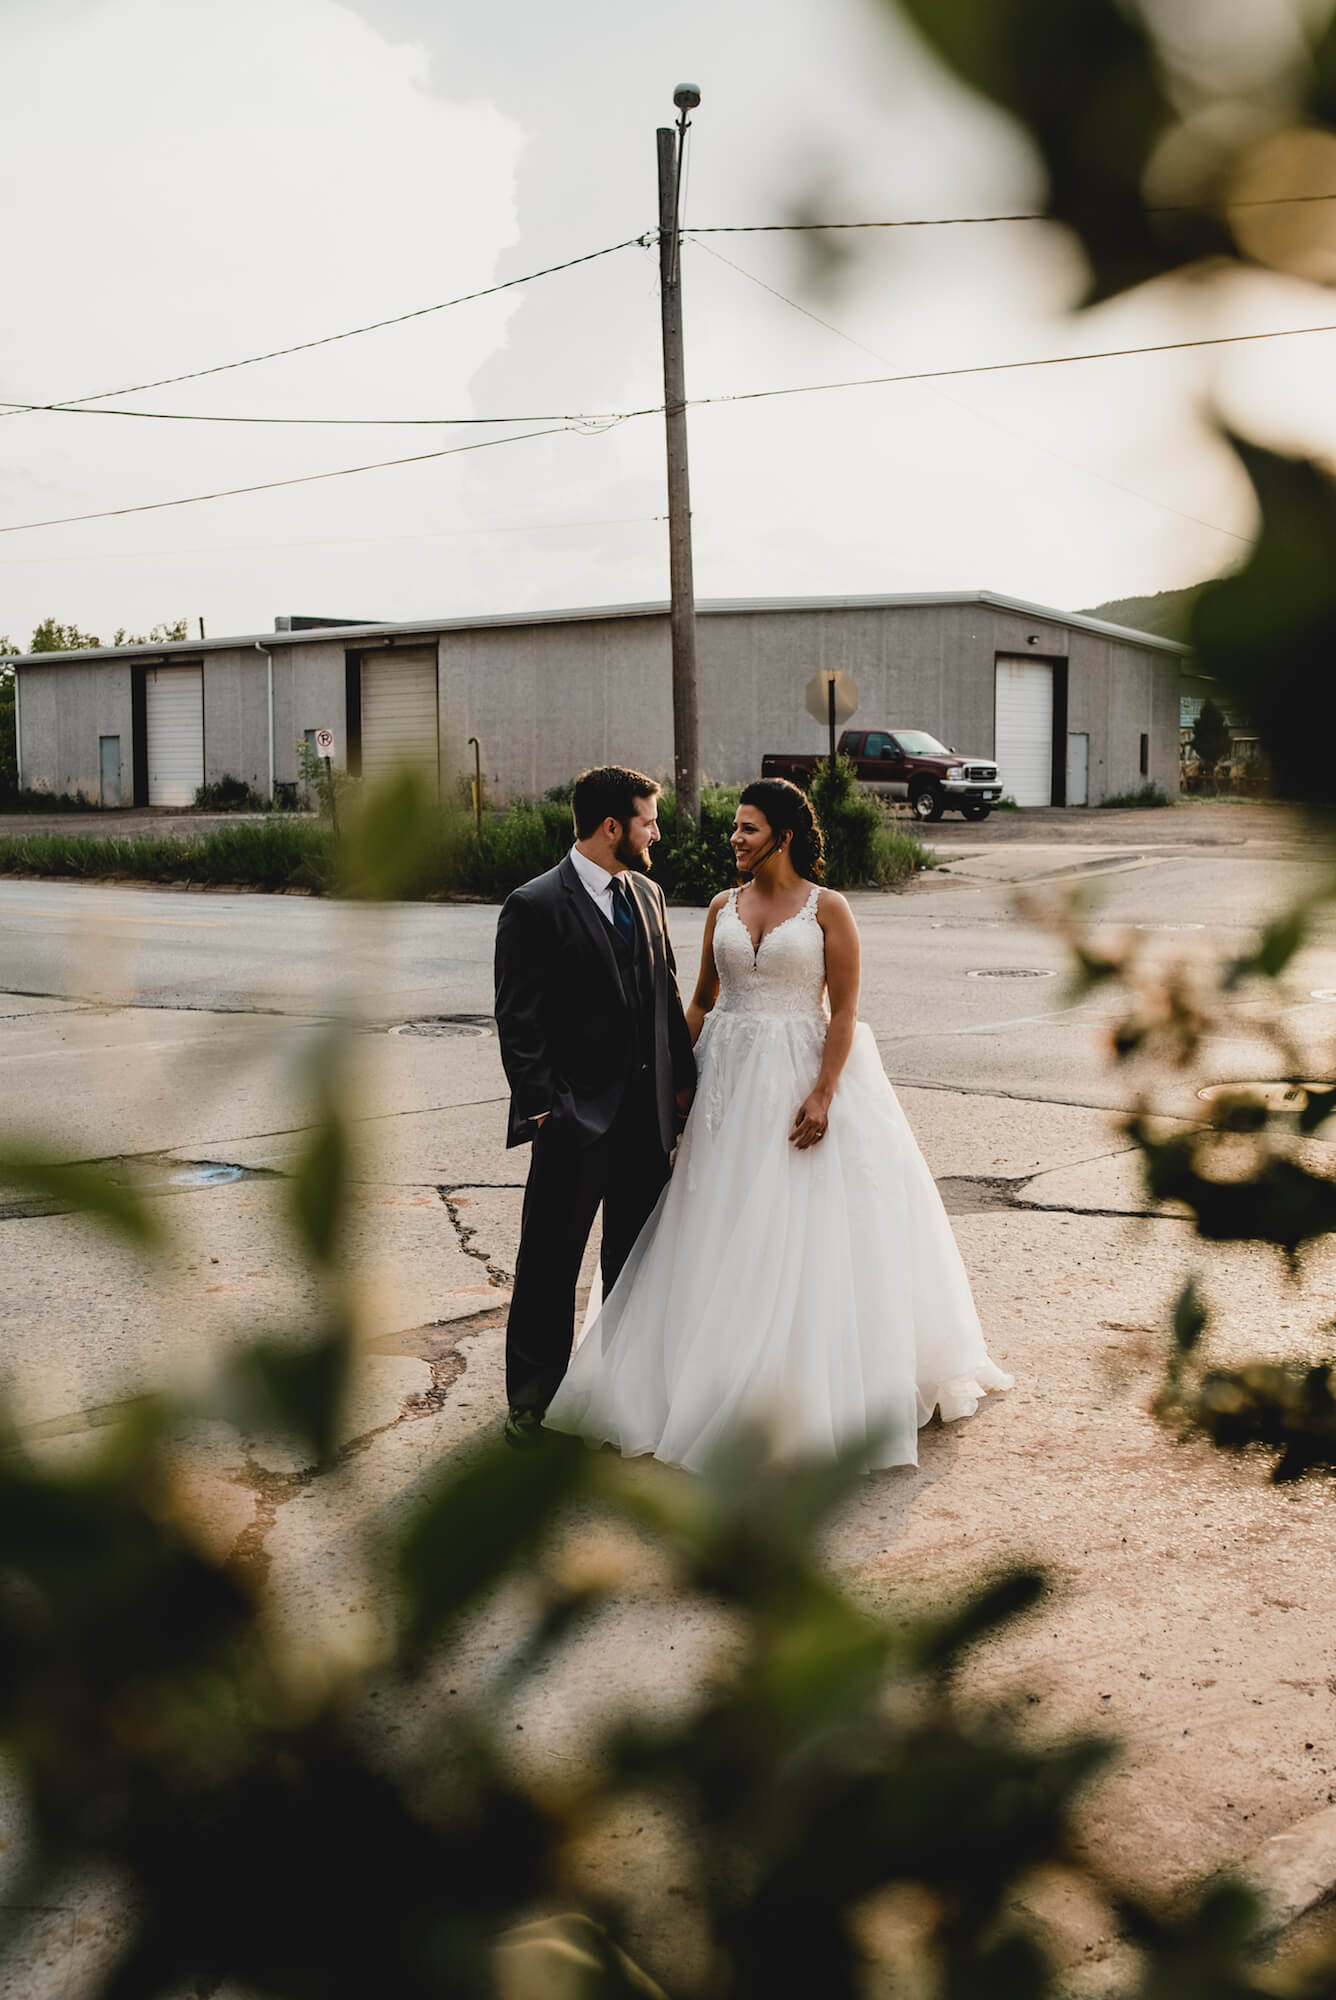 engle-olson-jen-chad-minnesota-wedding- (1182 of 1332).jpg